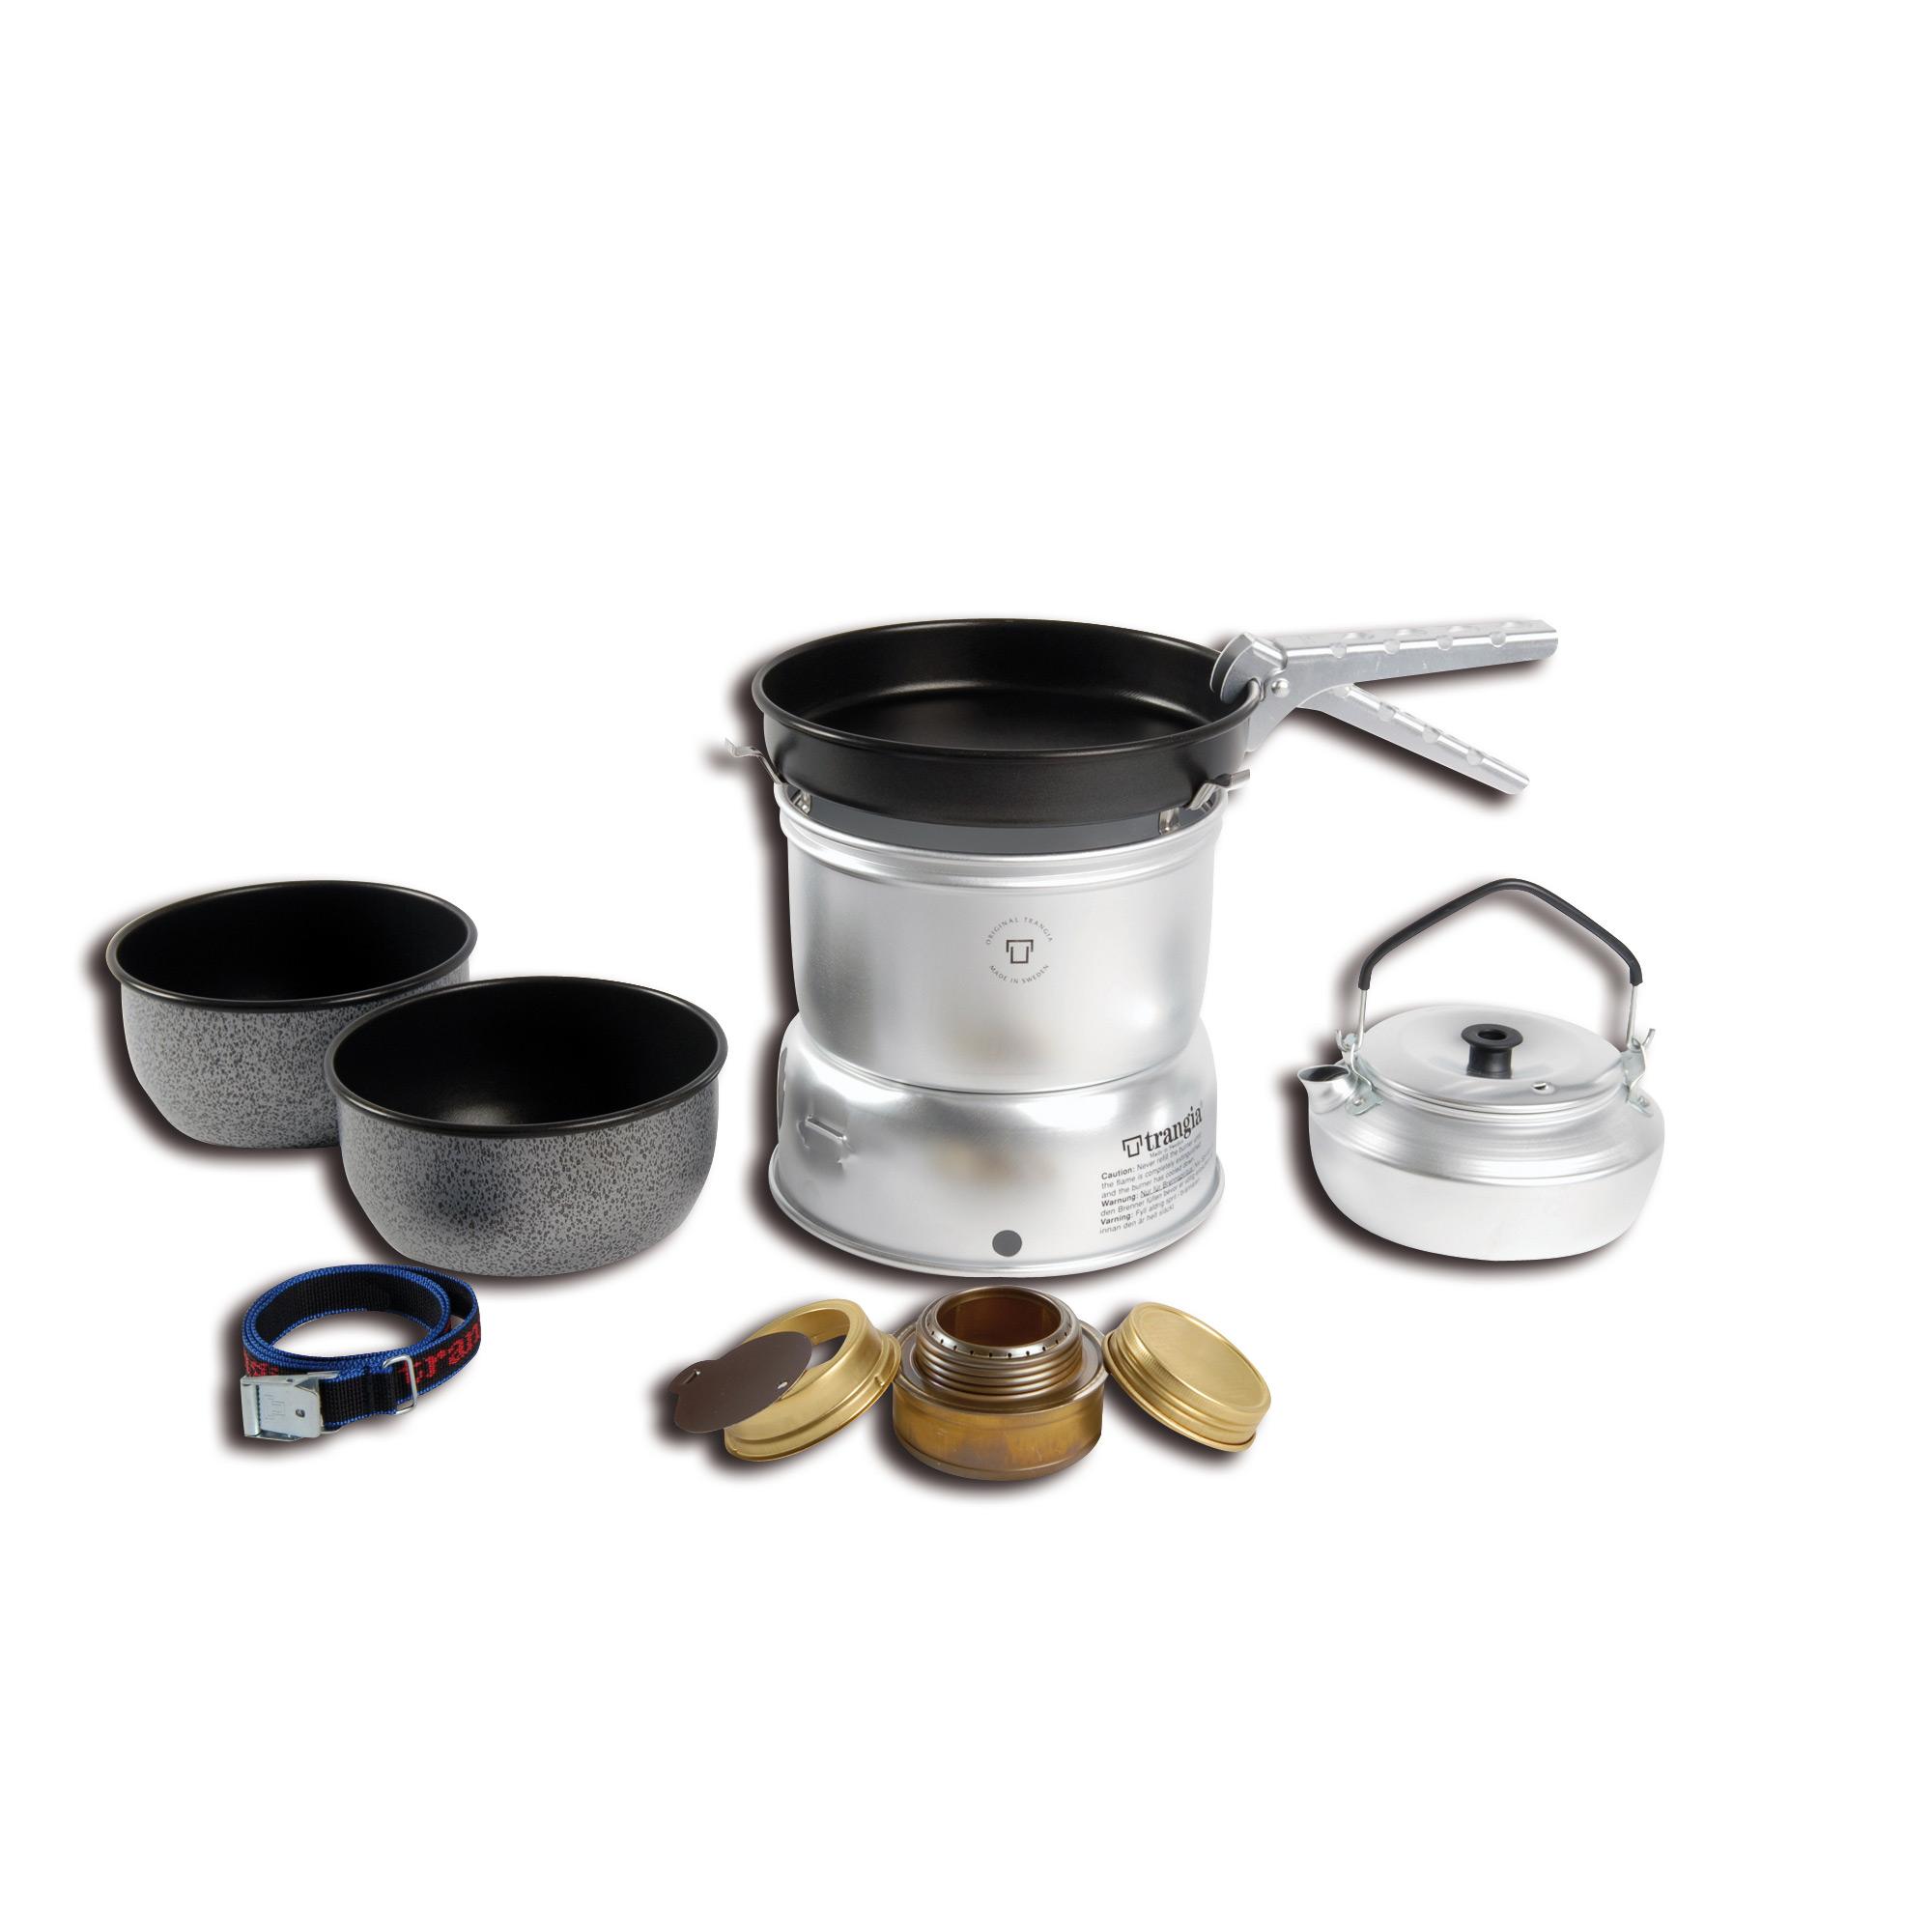 Cooker Trangia 27-6 UL